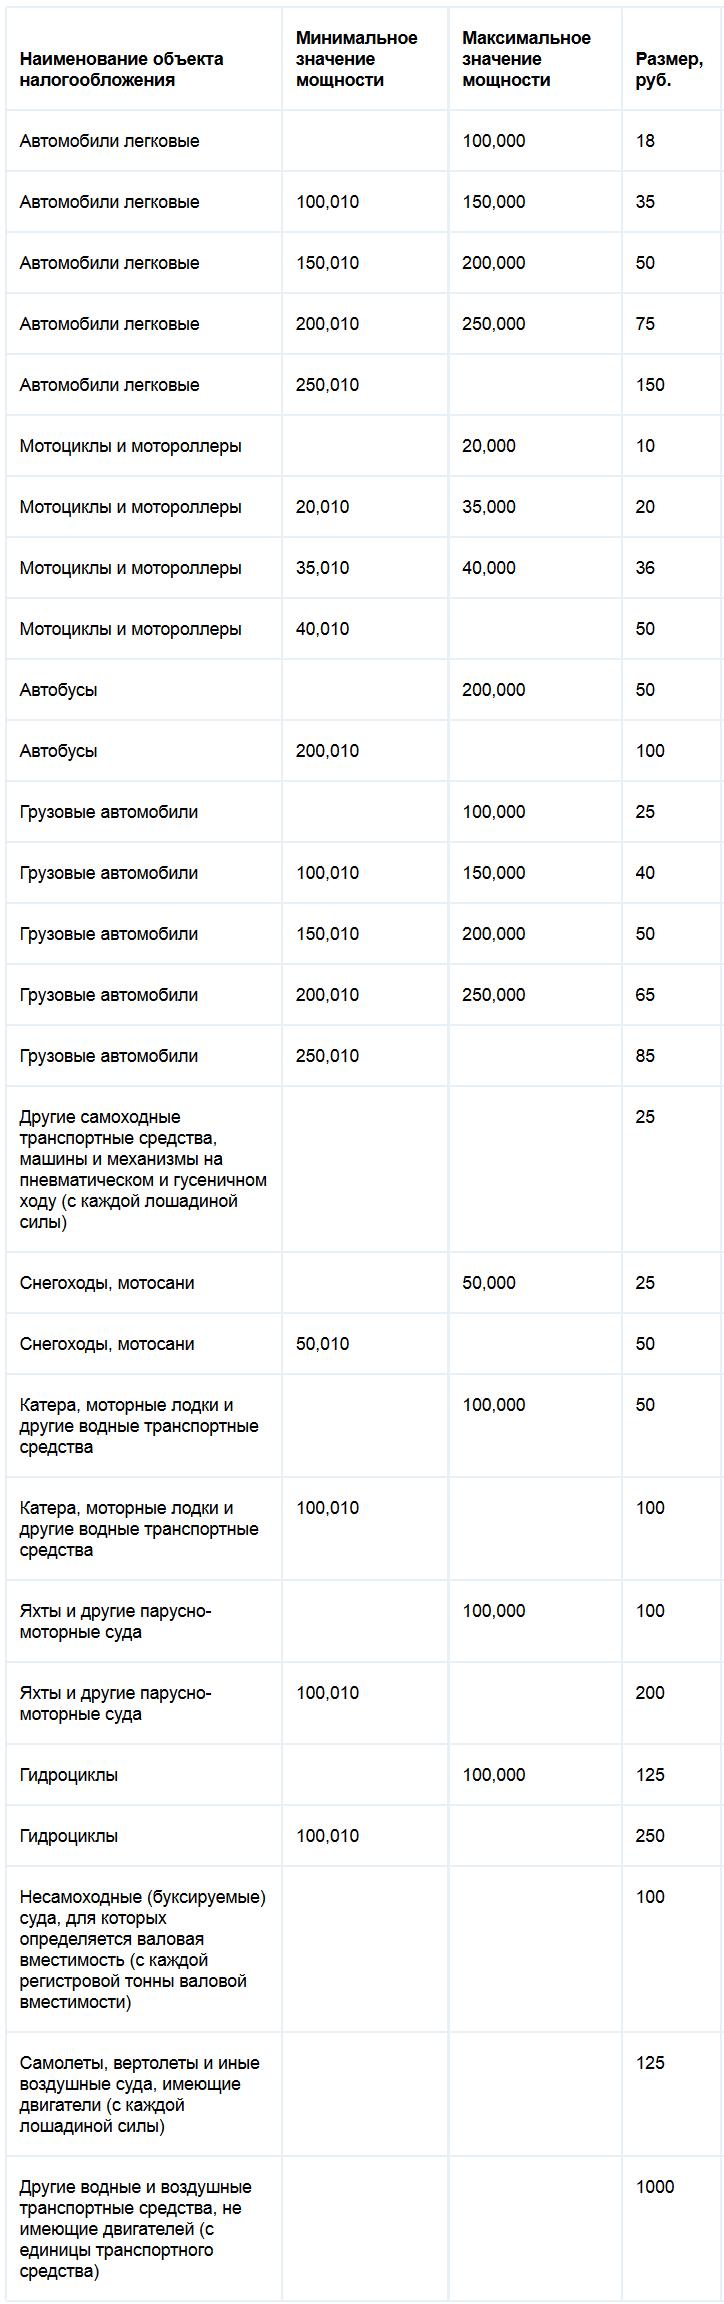 Договор субподрядчика с субсубподрядчиком